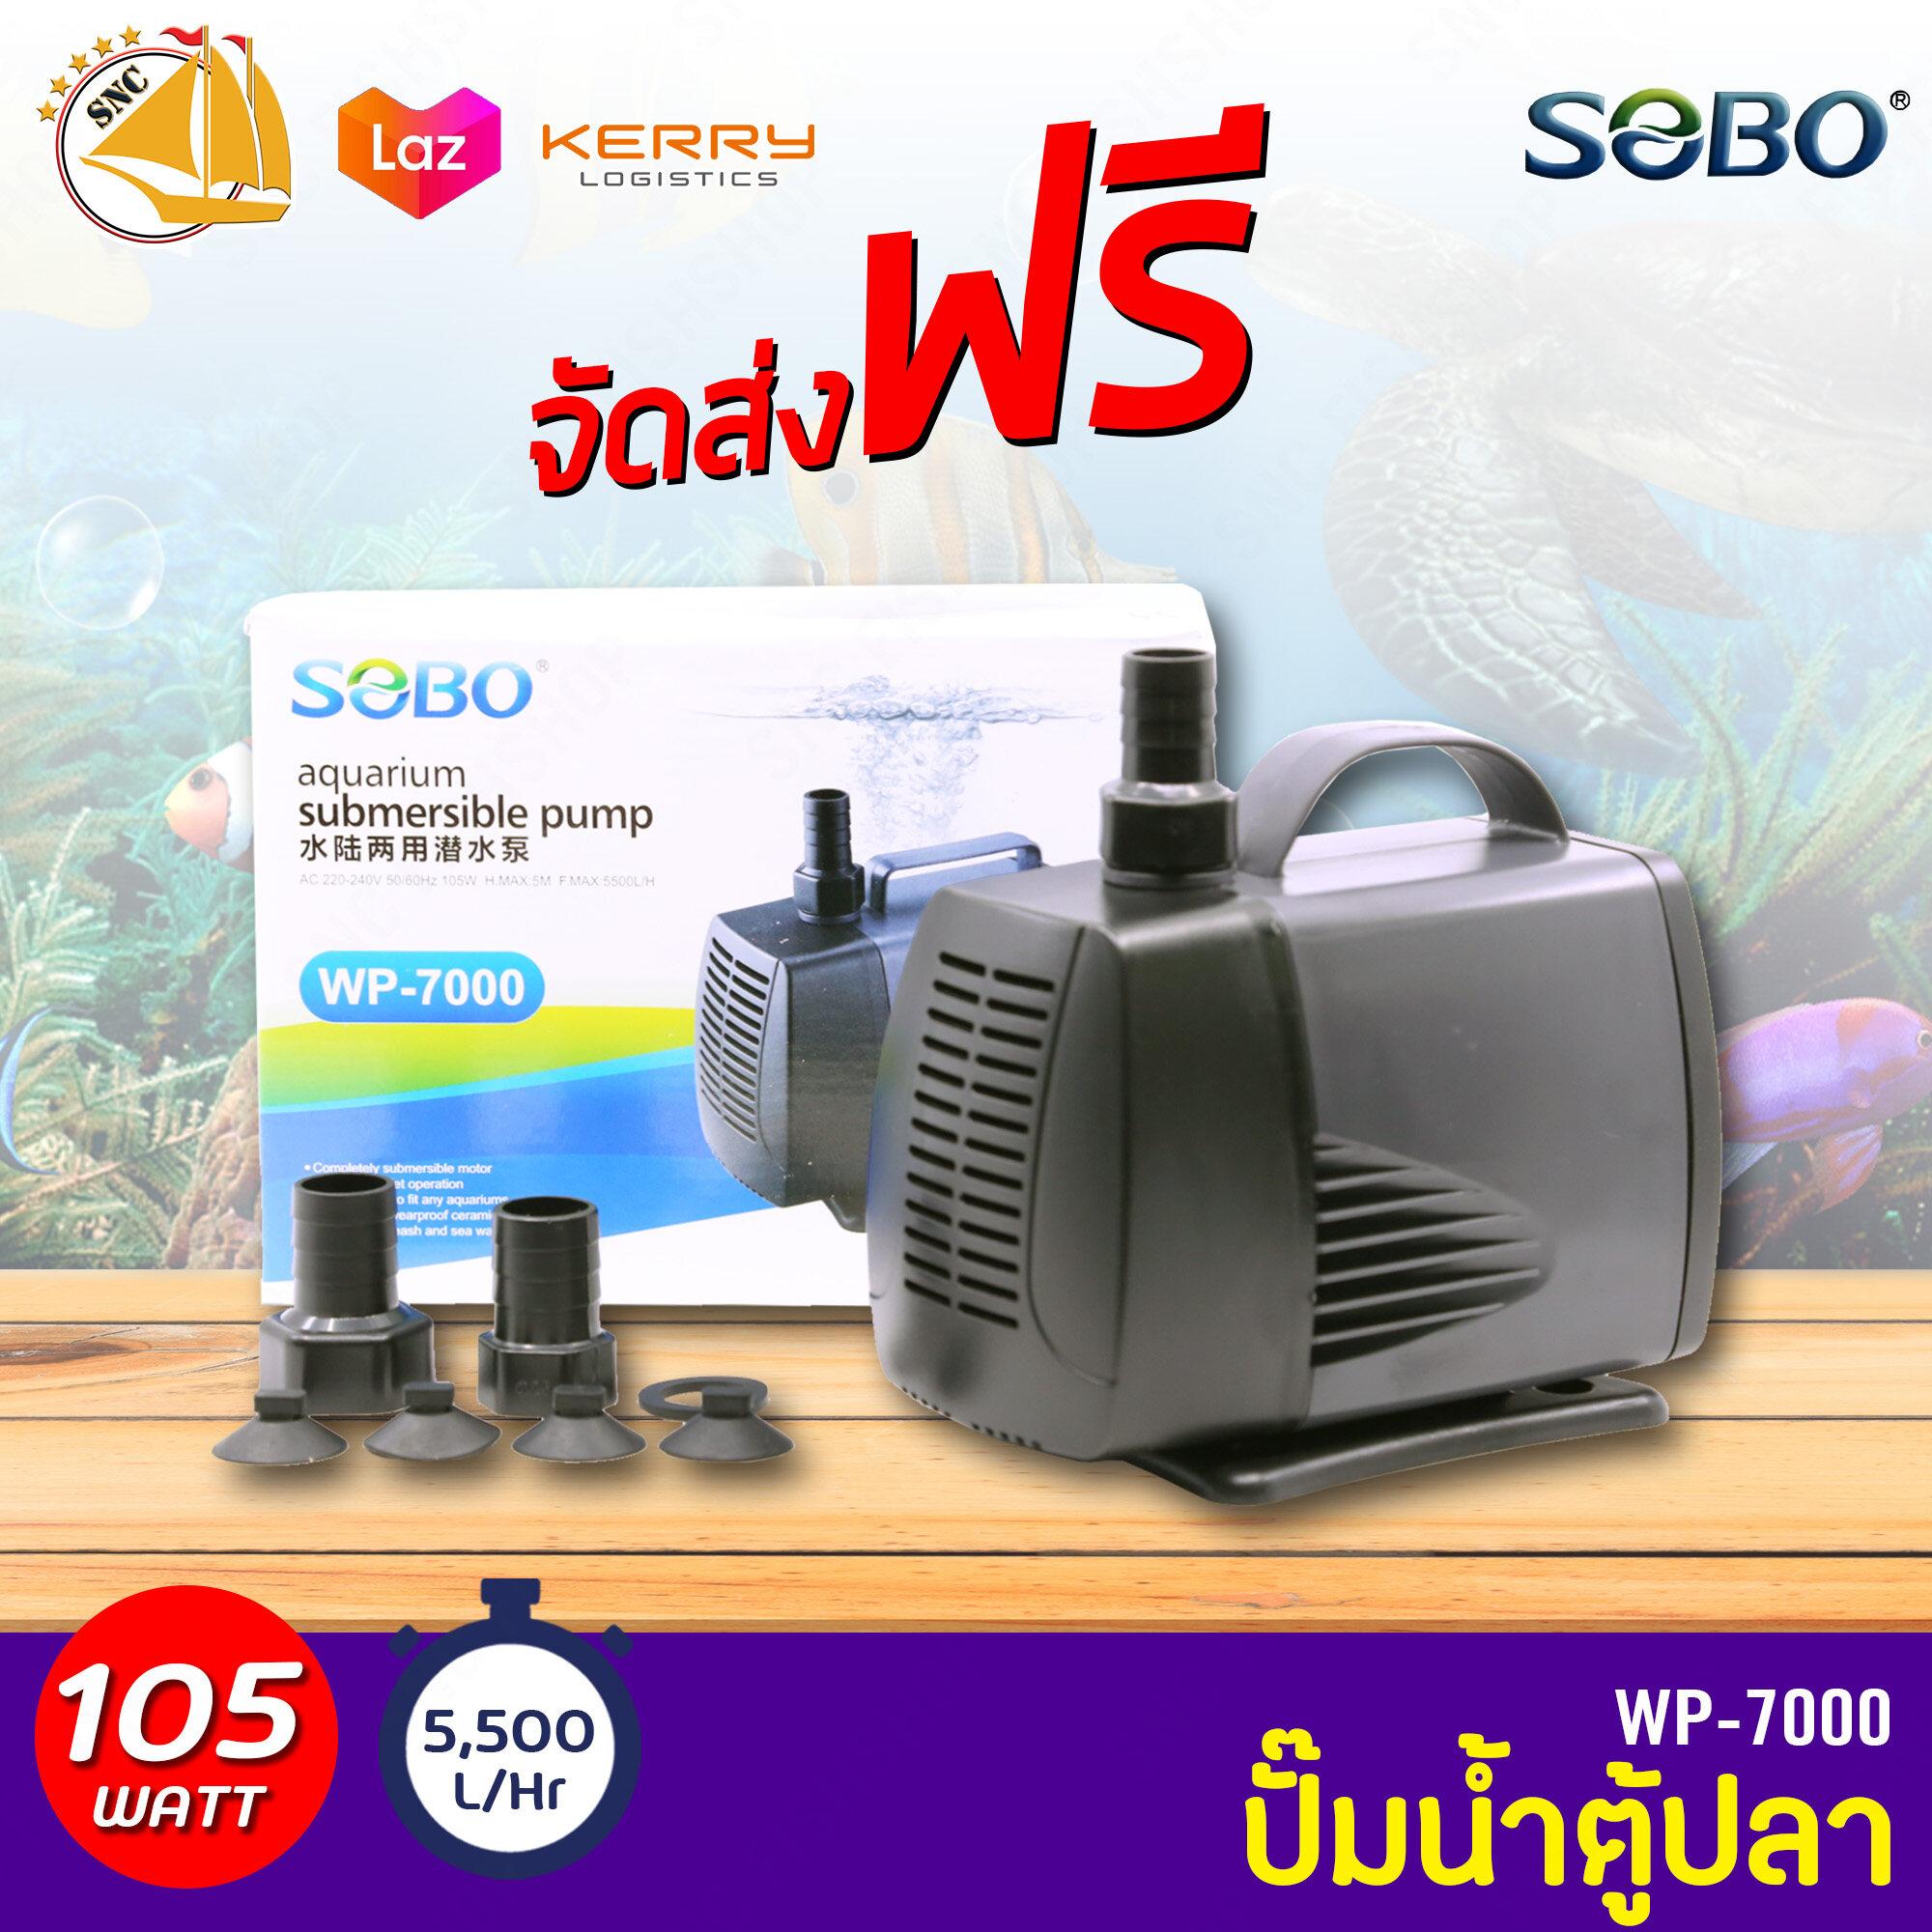 SOBO WP-7000 ปั๊มน้ำตู้ปลา บ่อปลา กำลังไฟ 105w 5500ลิตร/1ช.ม. WP7000